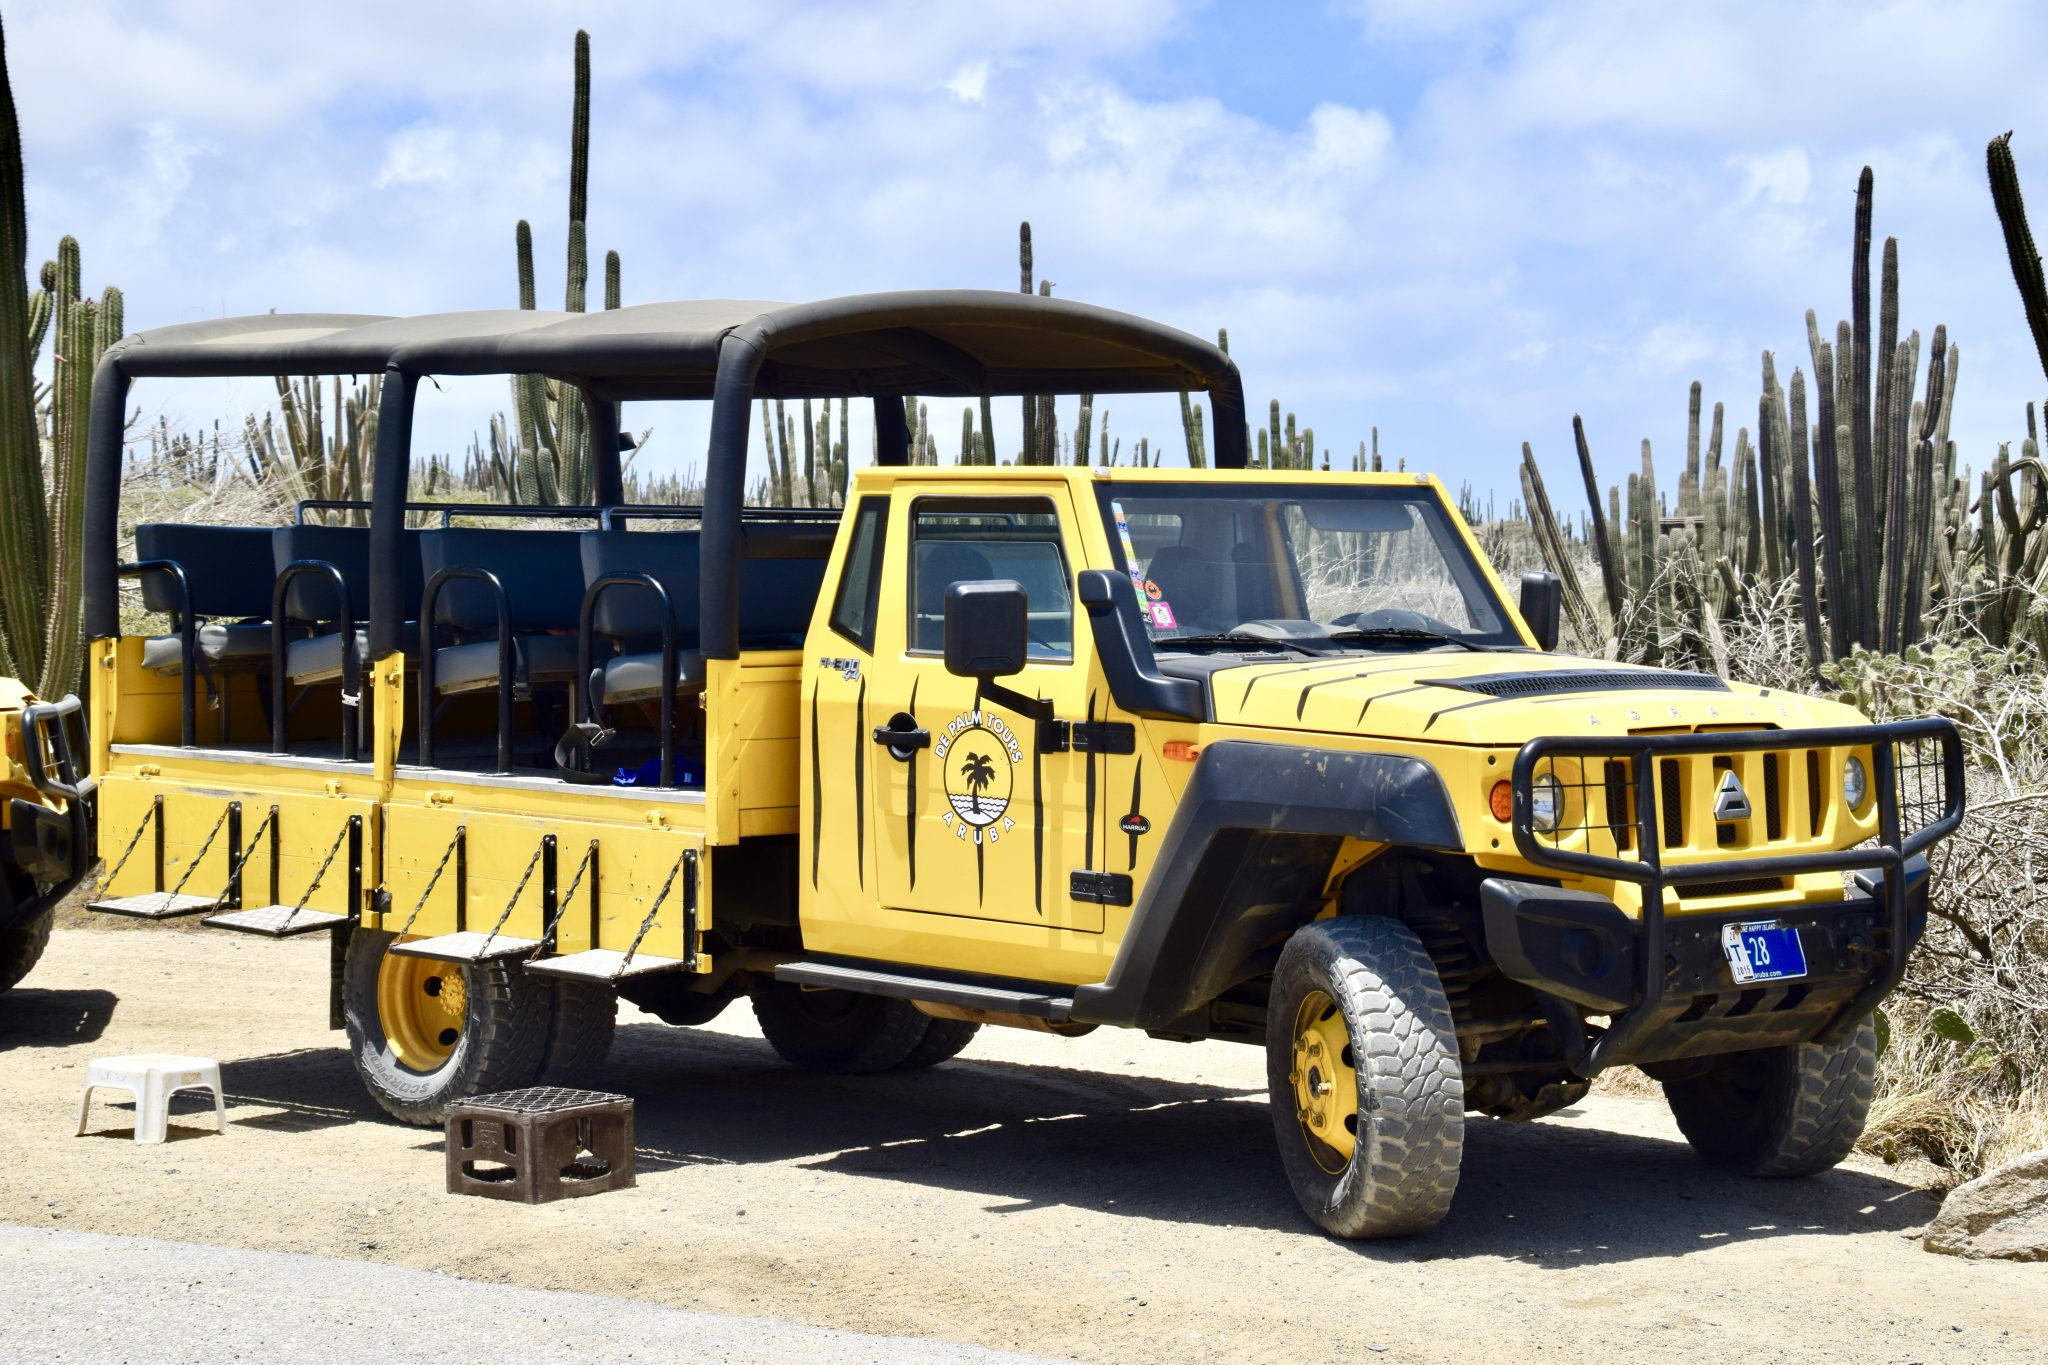 DePalm Tours Aruba off-road jeep